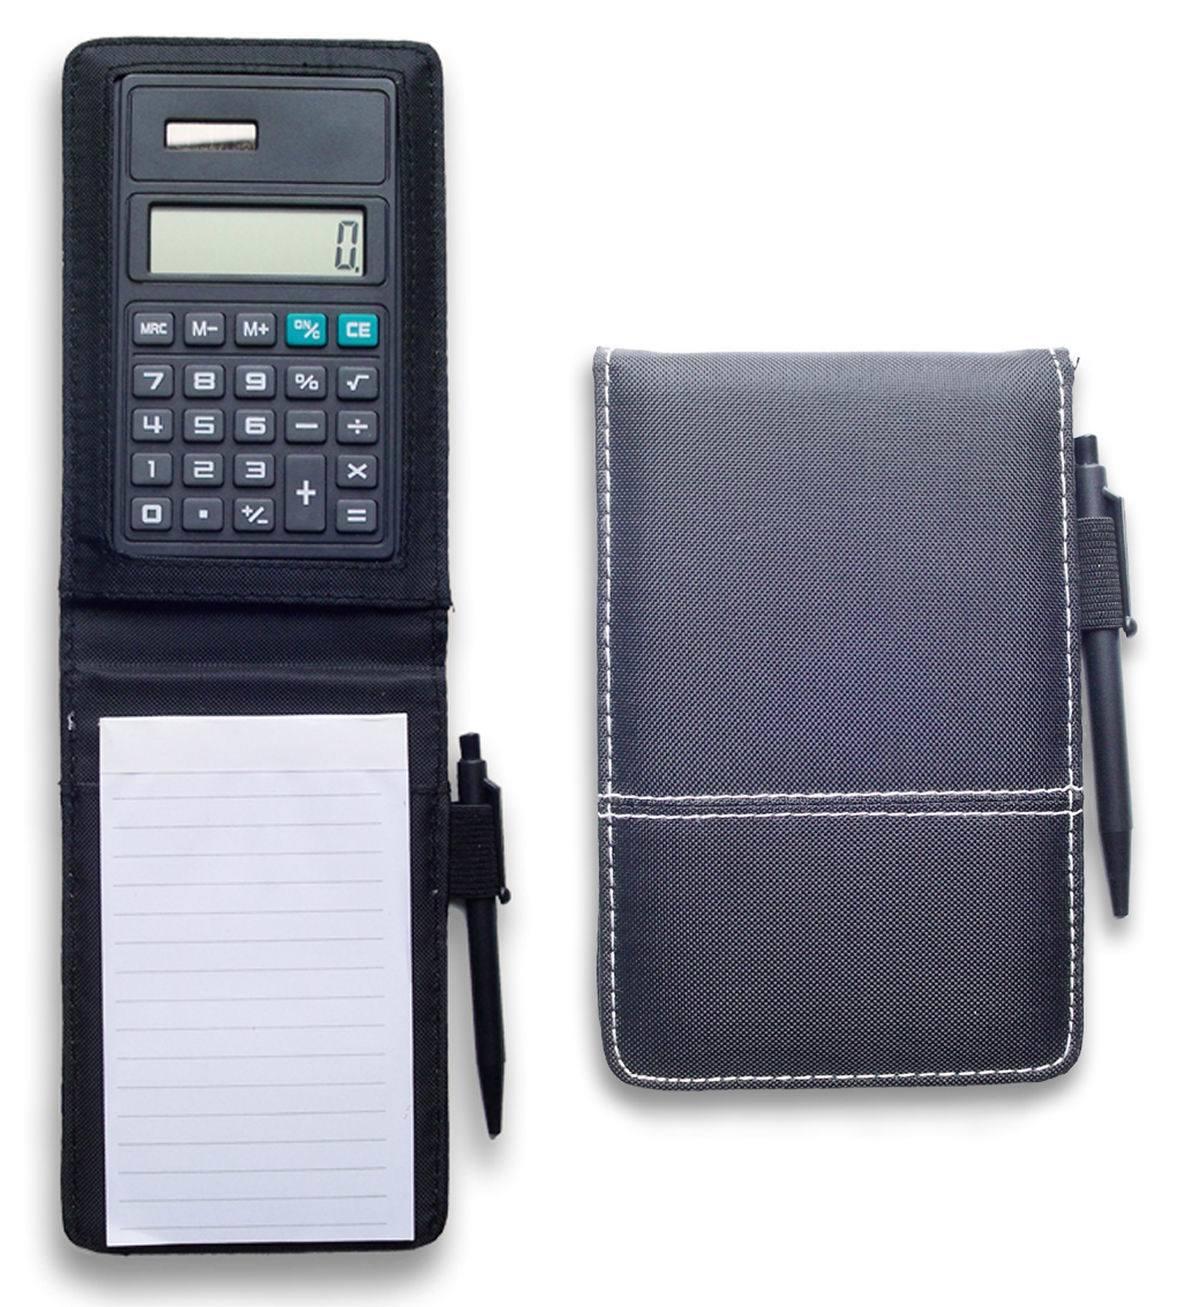 Notepad Calculator (SH-538A)